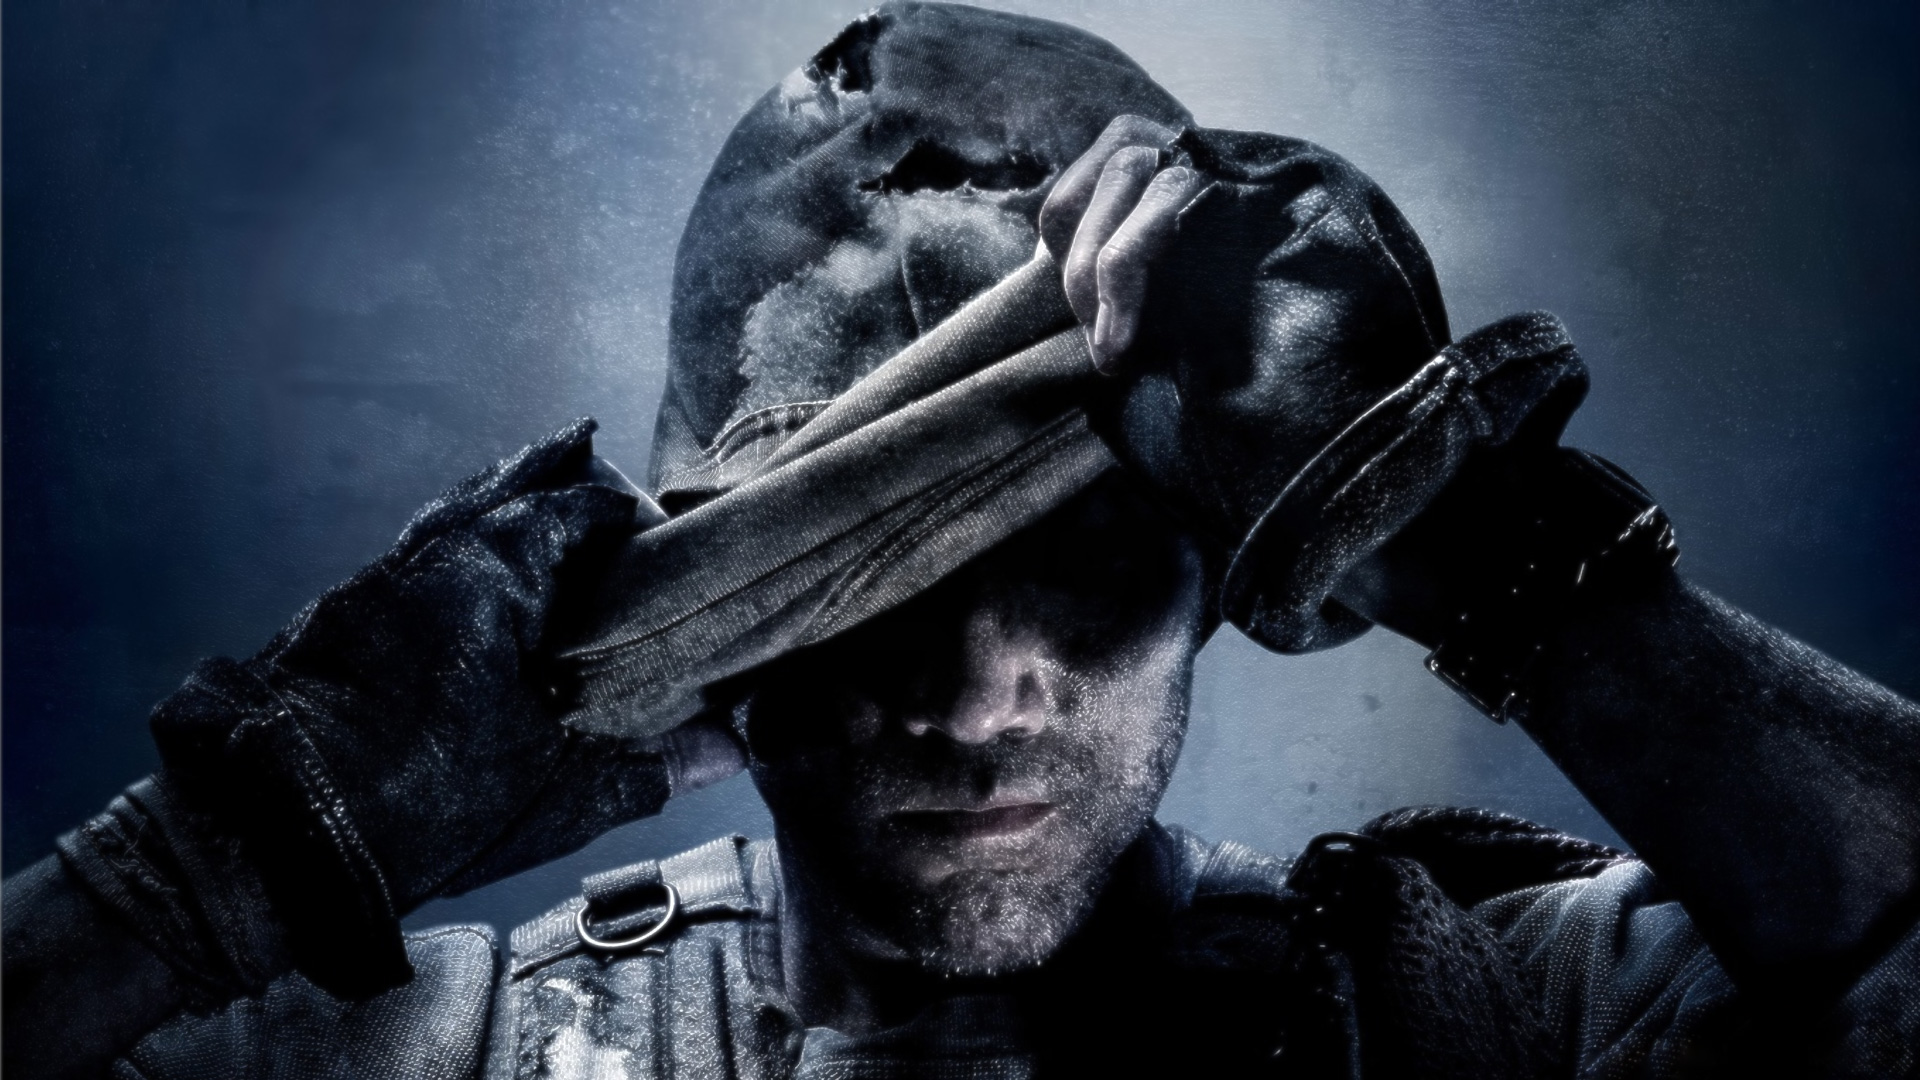 Of Duty Ghosts Wallpaper HD Wallpaper Area HD Wallpapers Download 1920x1080